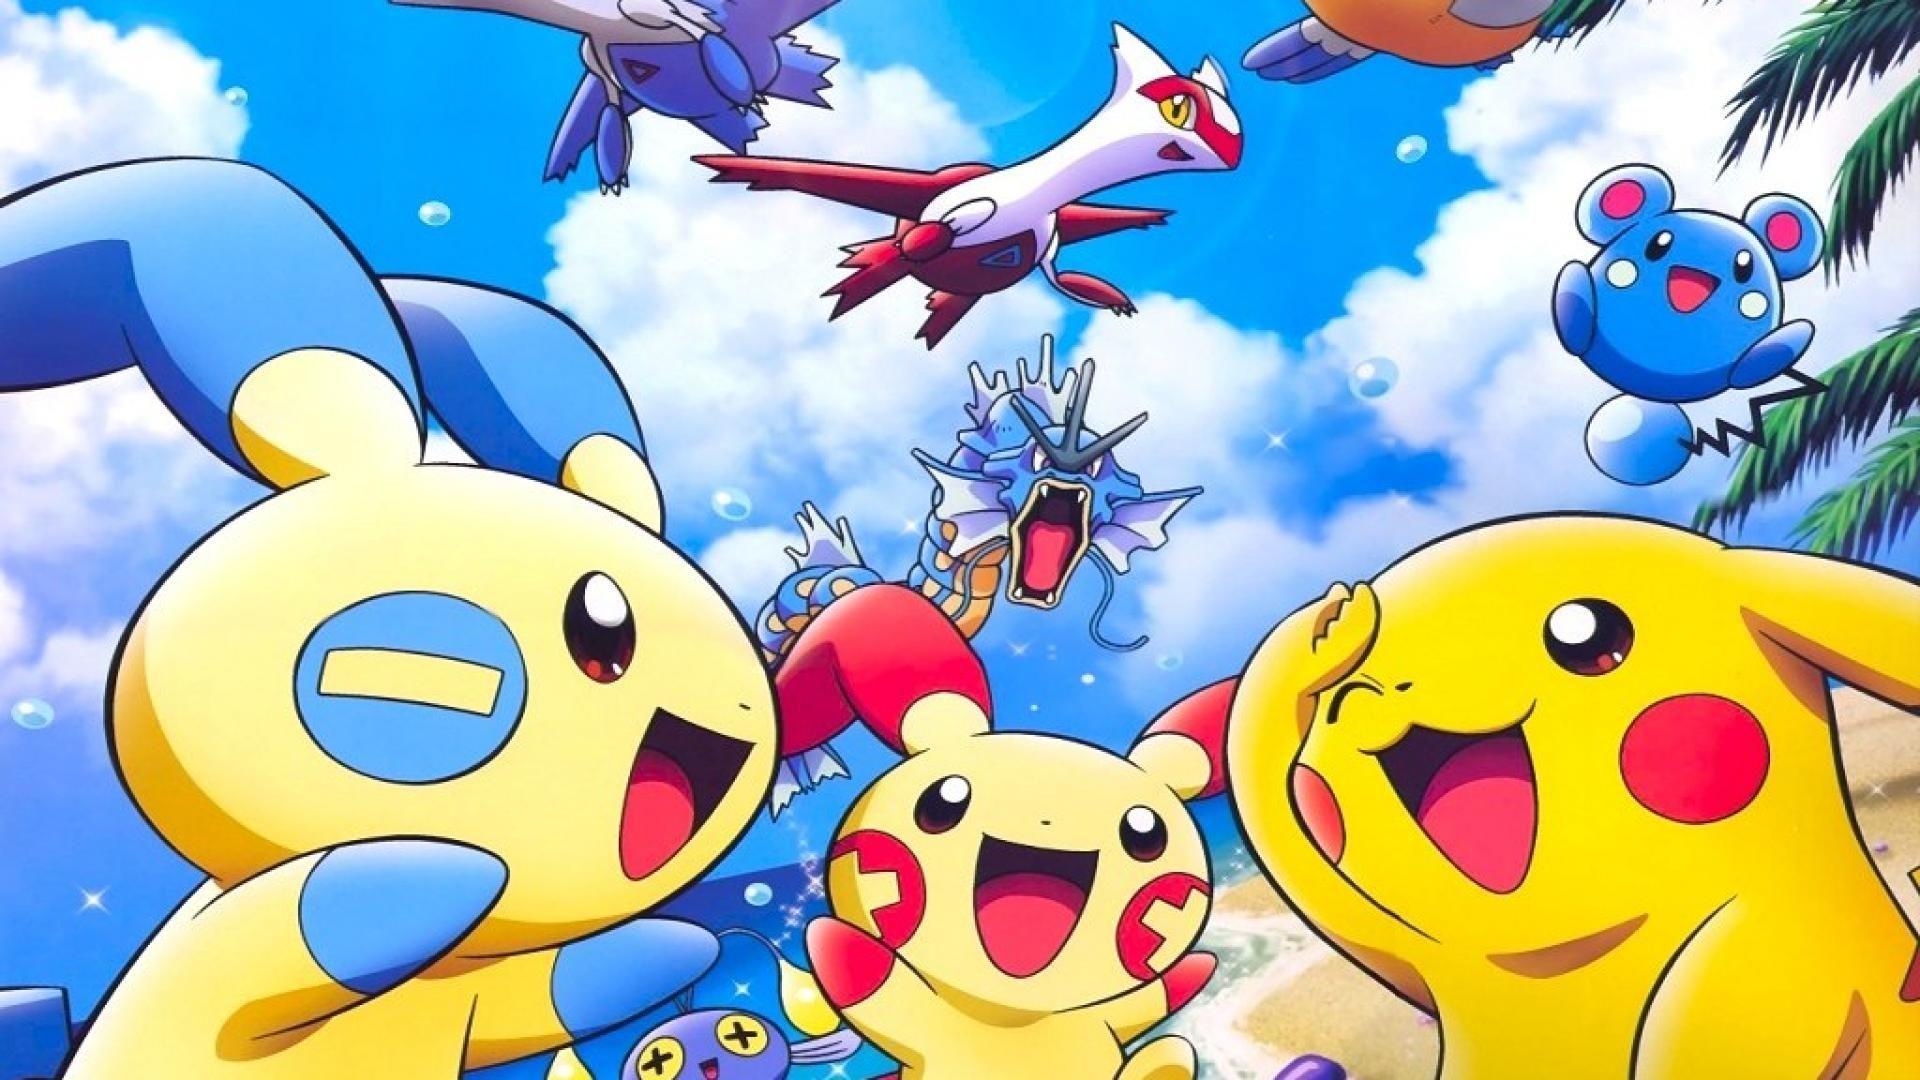 Https I Pinimg Com Originals C0 73 4e C0734e0e5751bf66896d2bced7a3b7cf Jpg Pokemon Android Wallpaper Cute Pokemon Wallpaper Pokemon